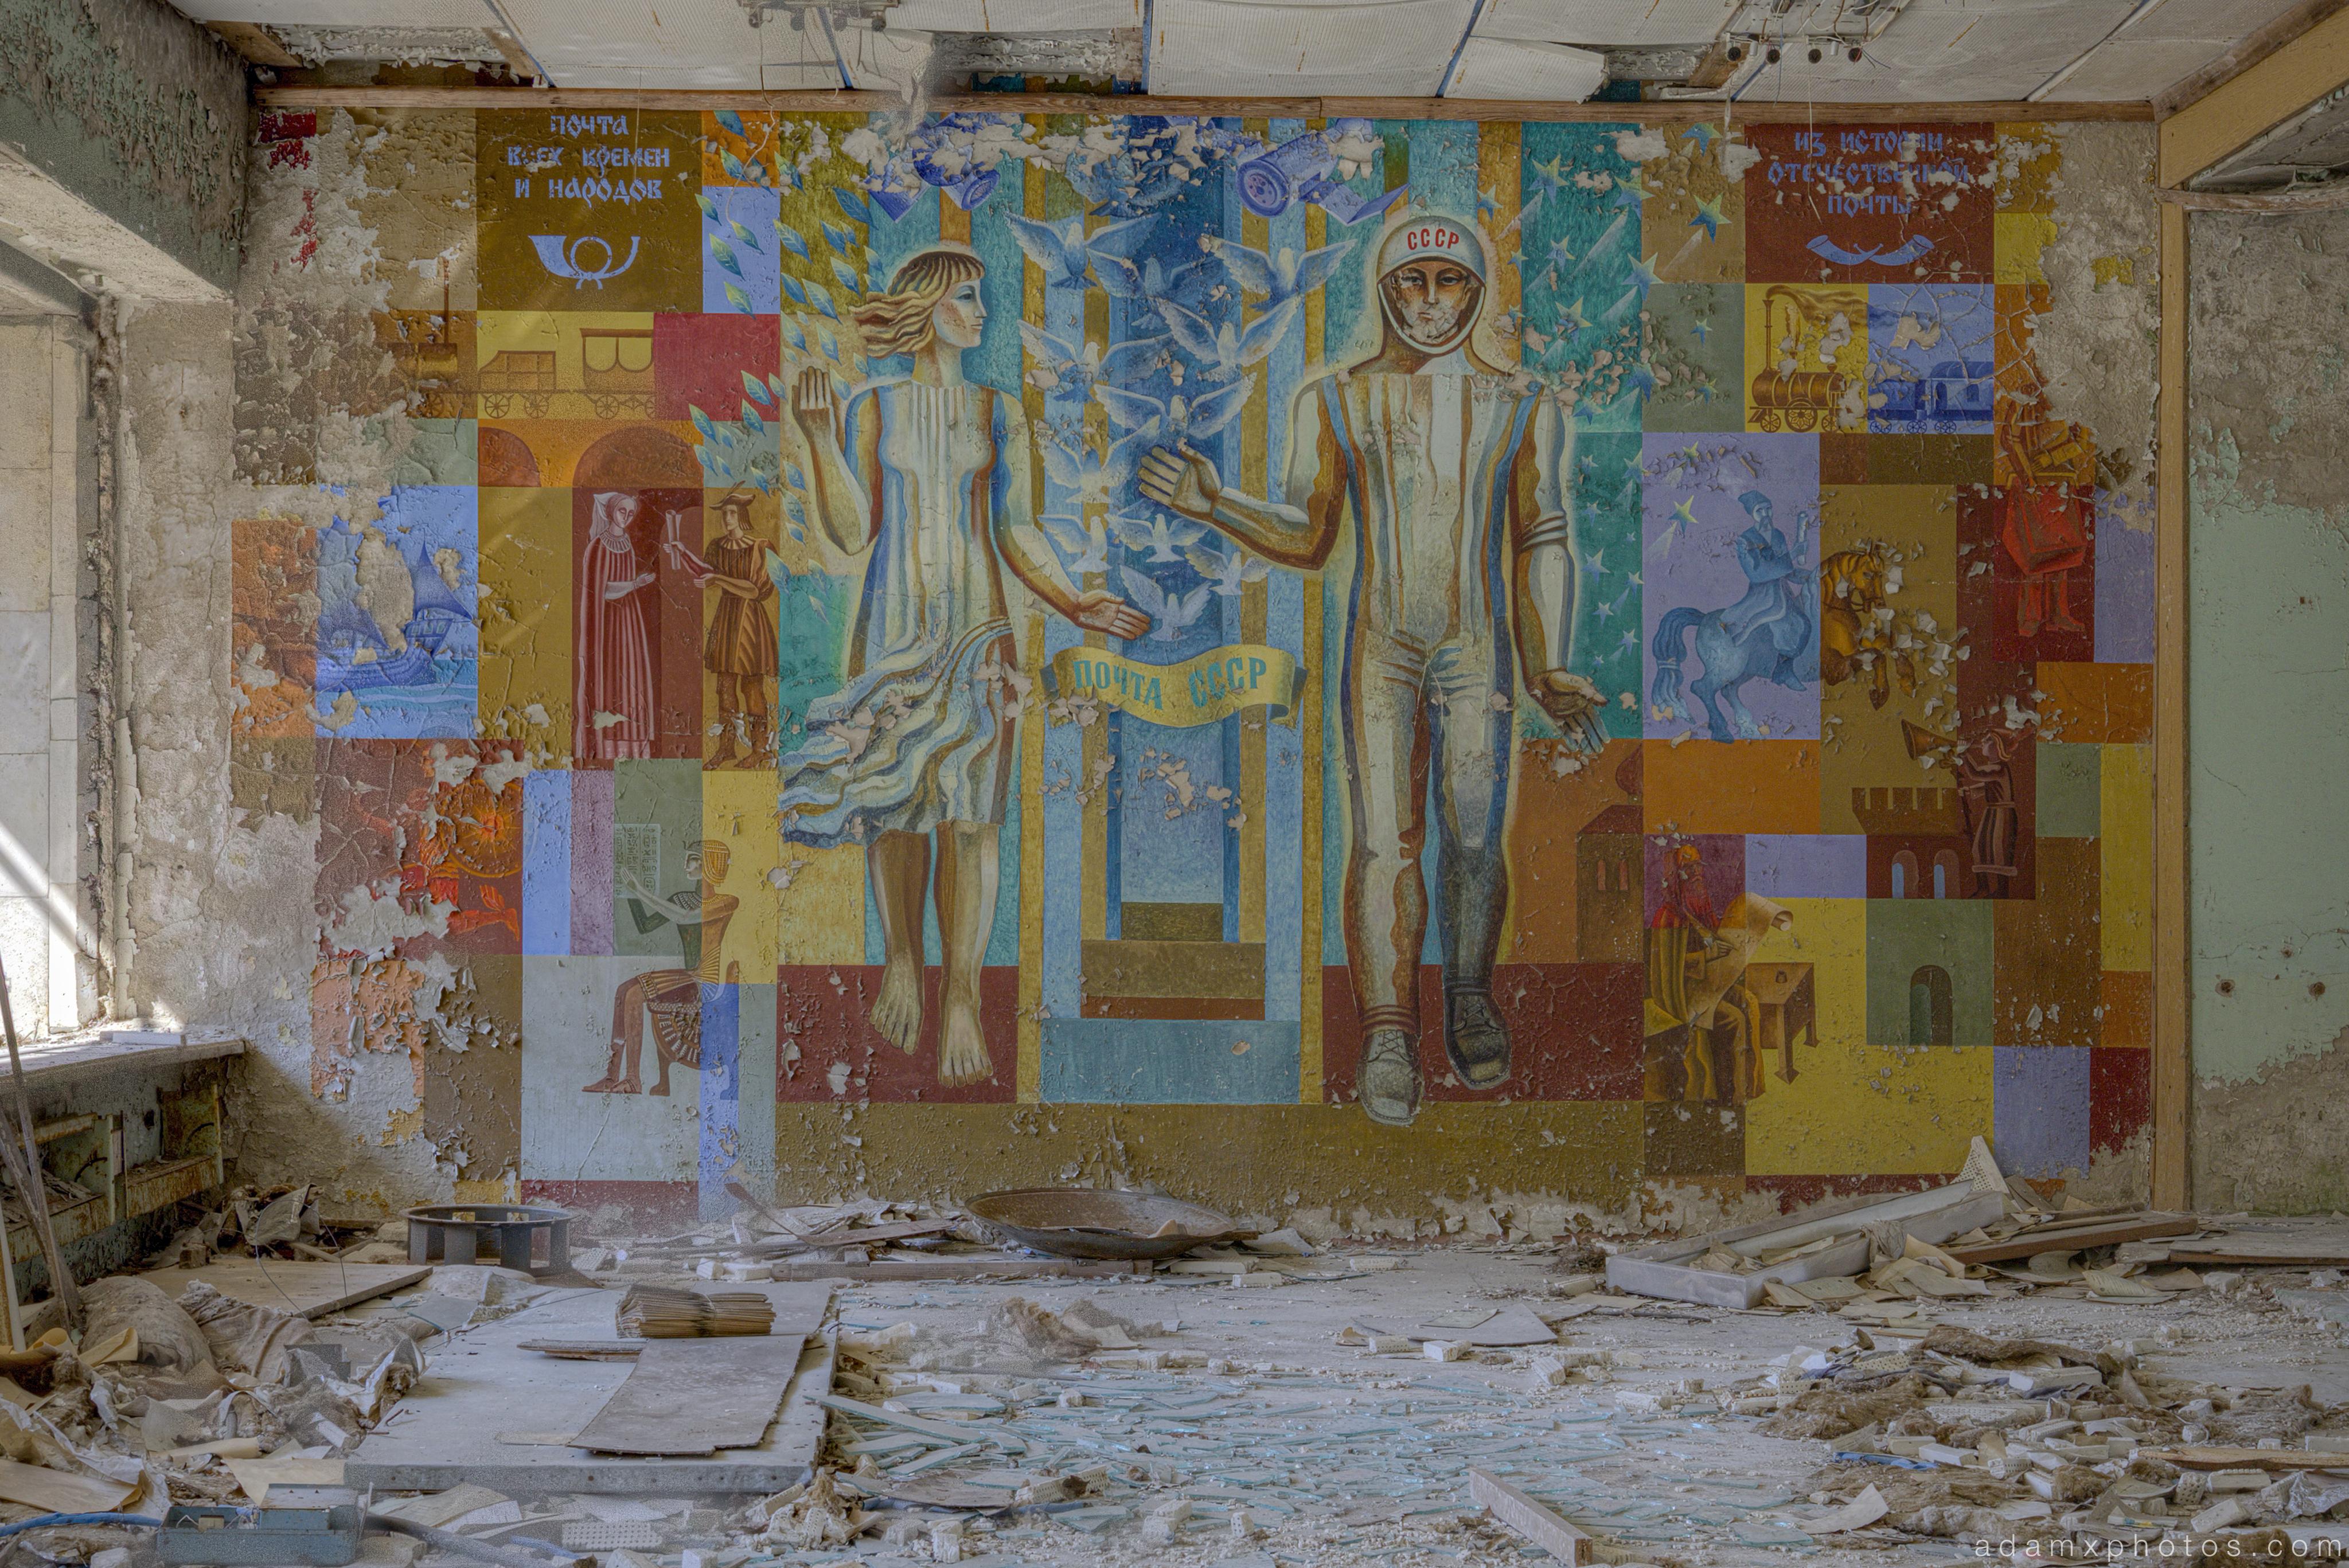 post office mural famous spaceman inside Chernobyl Pripyat Urbex Adam X Urban Exploration 2015 Abandoned decay lost forgotten derelict